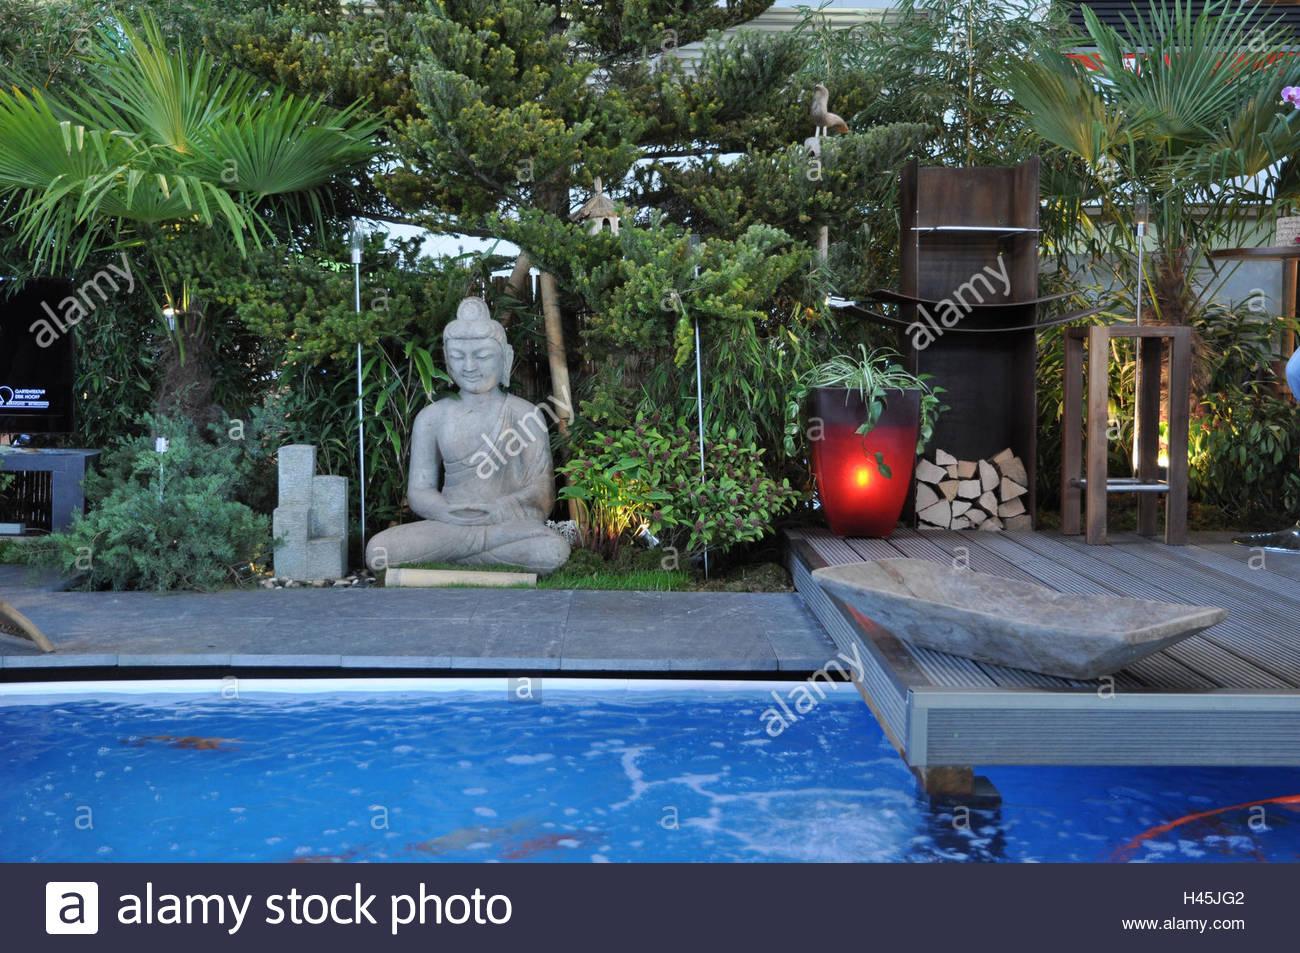 Full Size of Garten Whirlpool Stockfotos Bilder Alamy Rattan Sofa Lounge Möbel Versicherung Kräutergarten Küche überdachung Sonnensegel Relaxsessel Aldi Schaukelstuhl Garten Garten Whirlpool